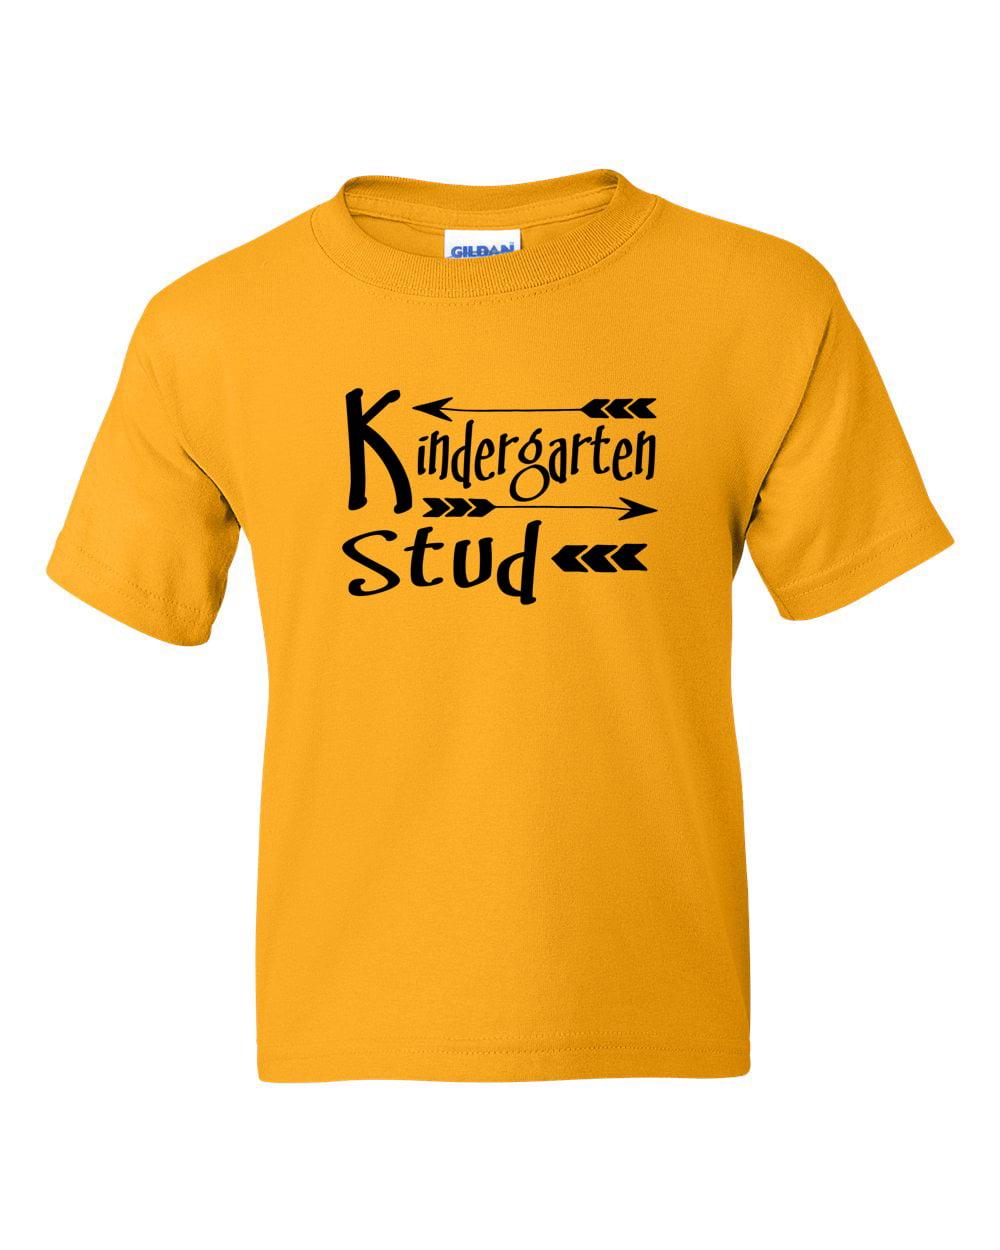 Kindergarten Stud Back to School Toddler Boys Short Sleeve T-Shirt